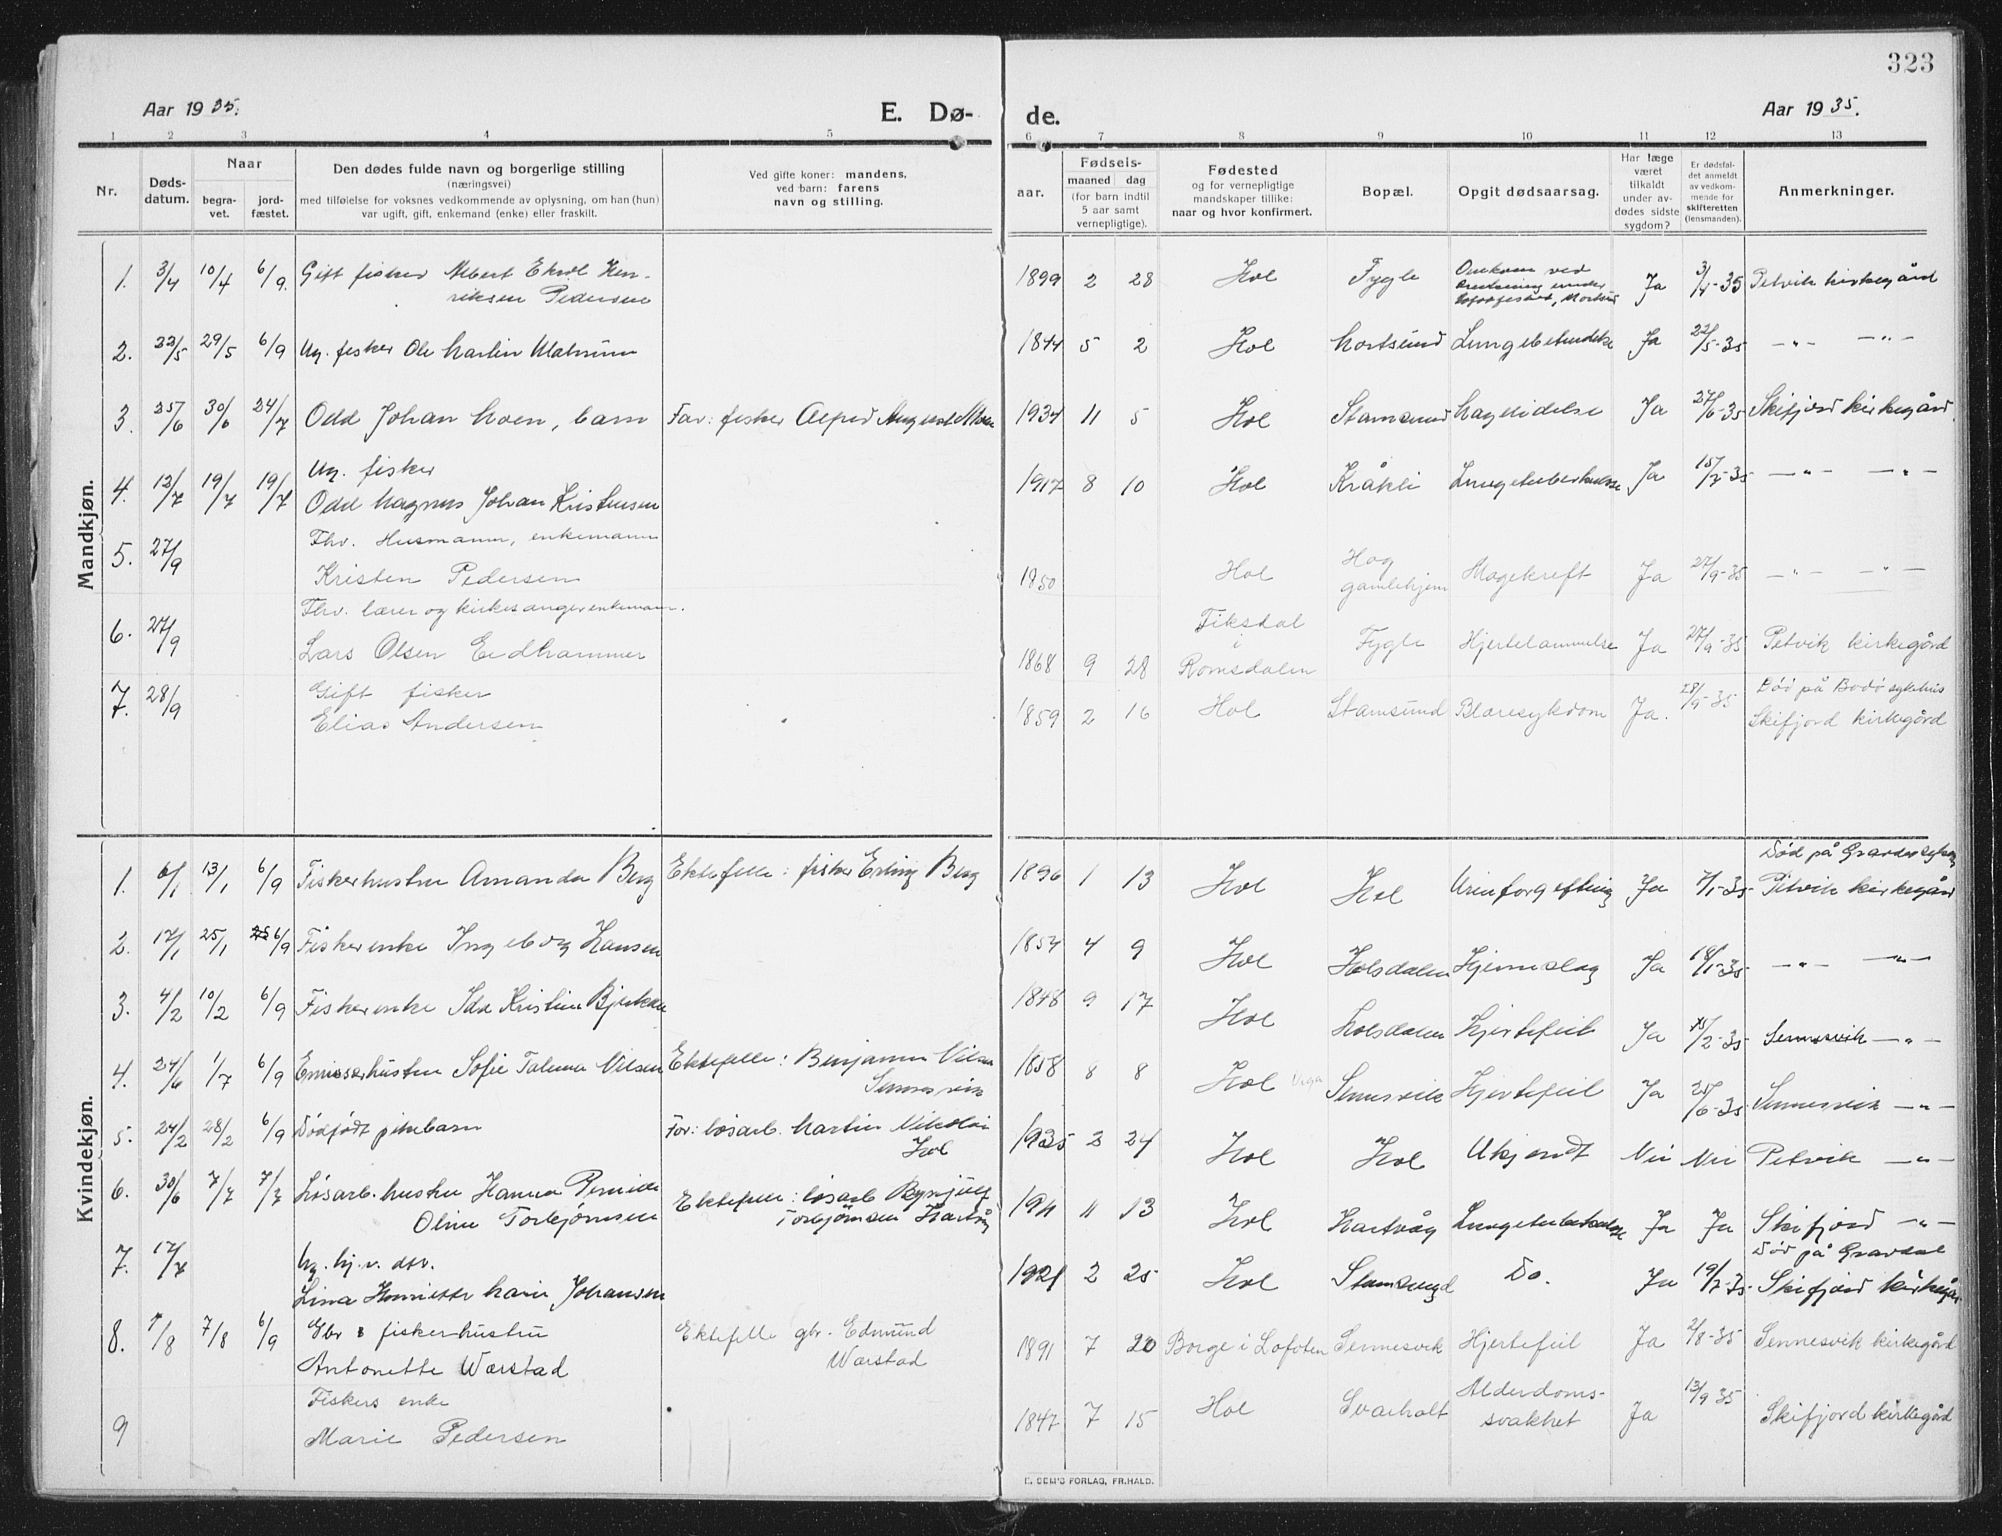 SAT, Ministerialprotokoller, klokkerbøker og fødselsregistre - Nordland, 882/L1183: Klokkerbok nr. 882C01, 1911-1938, s. 323